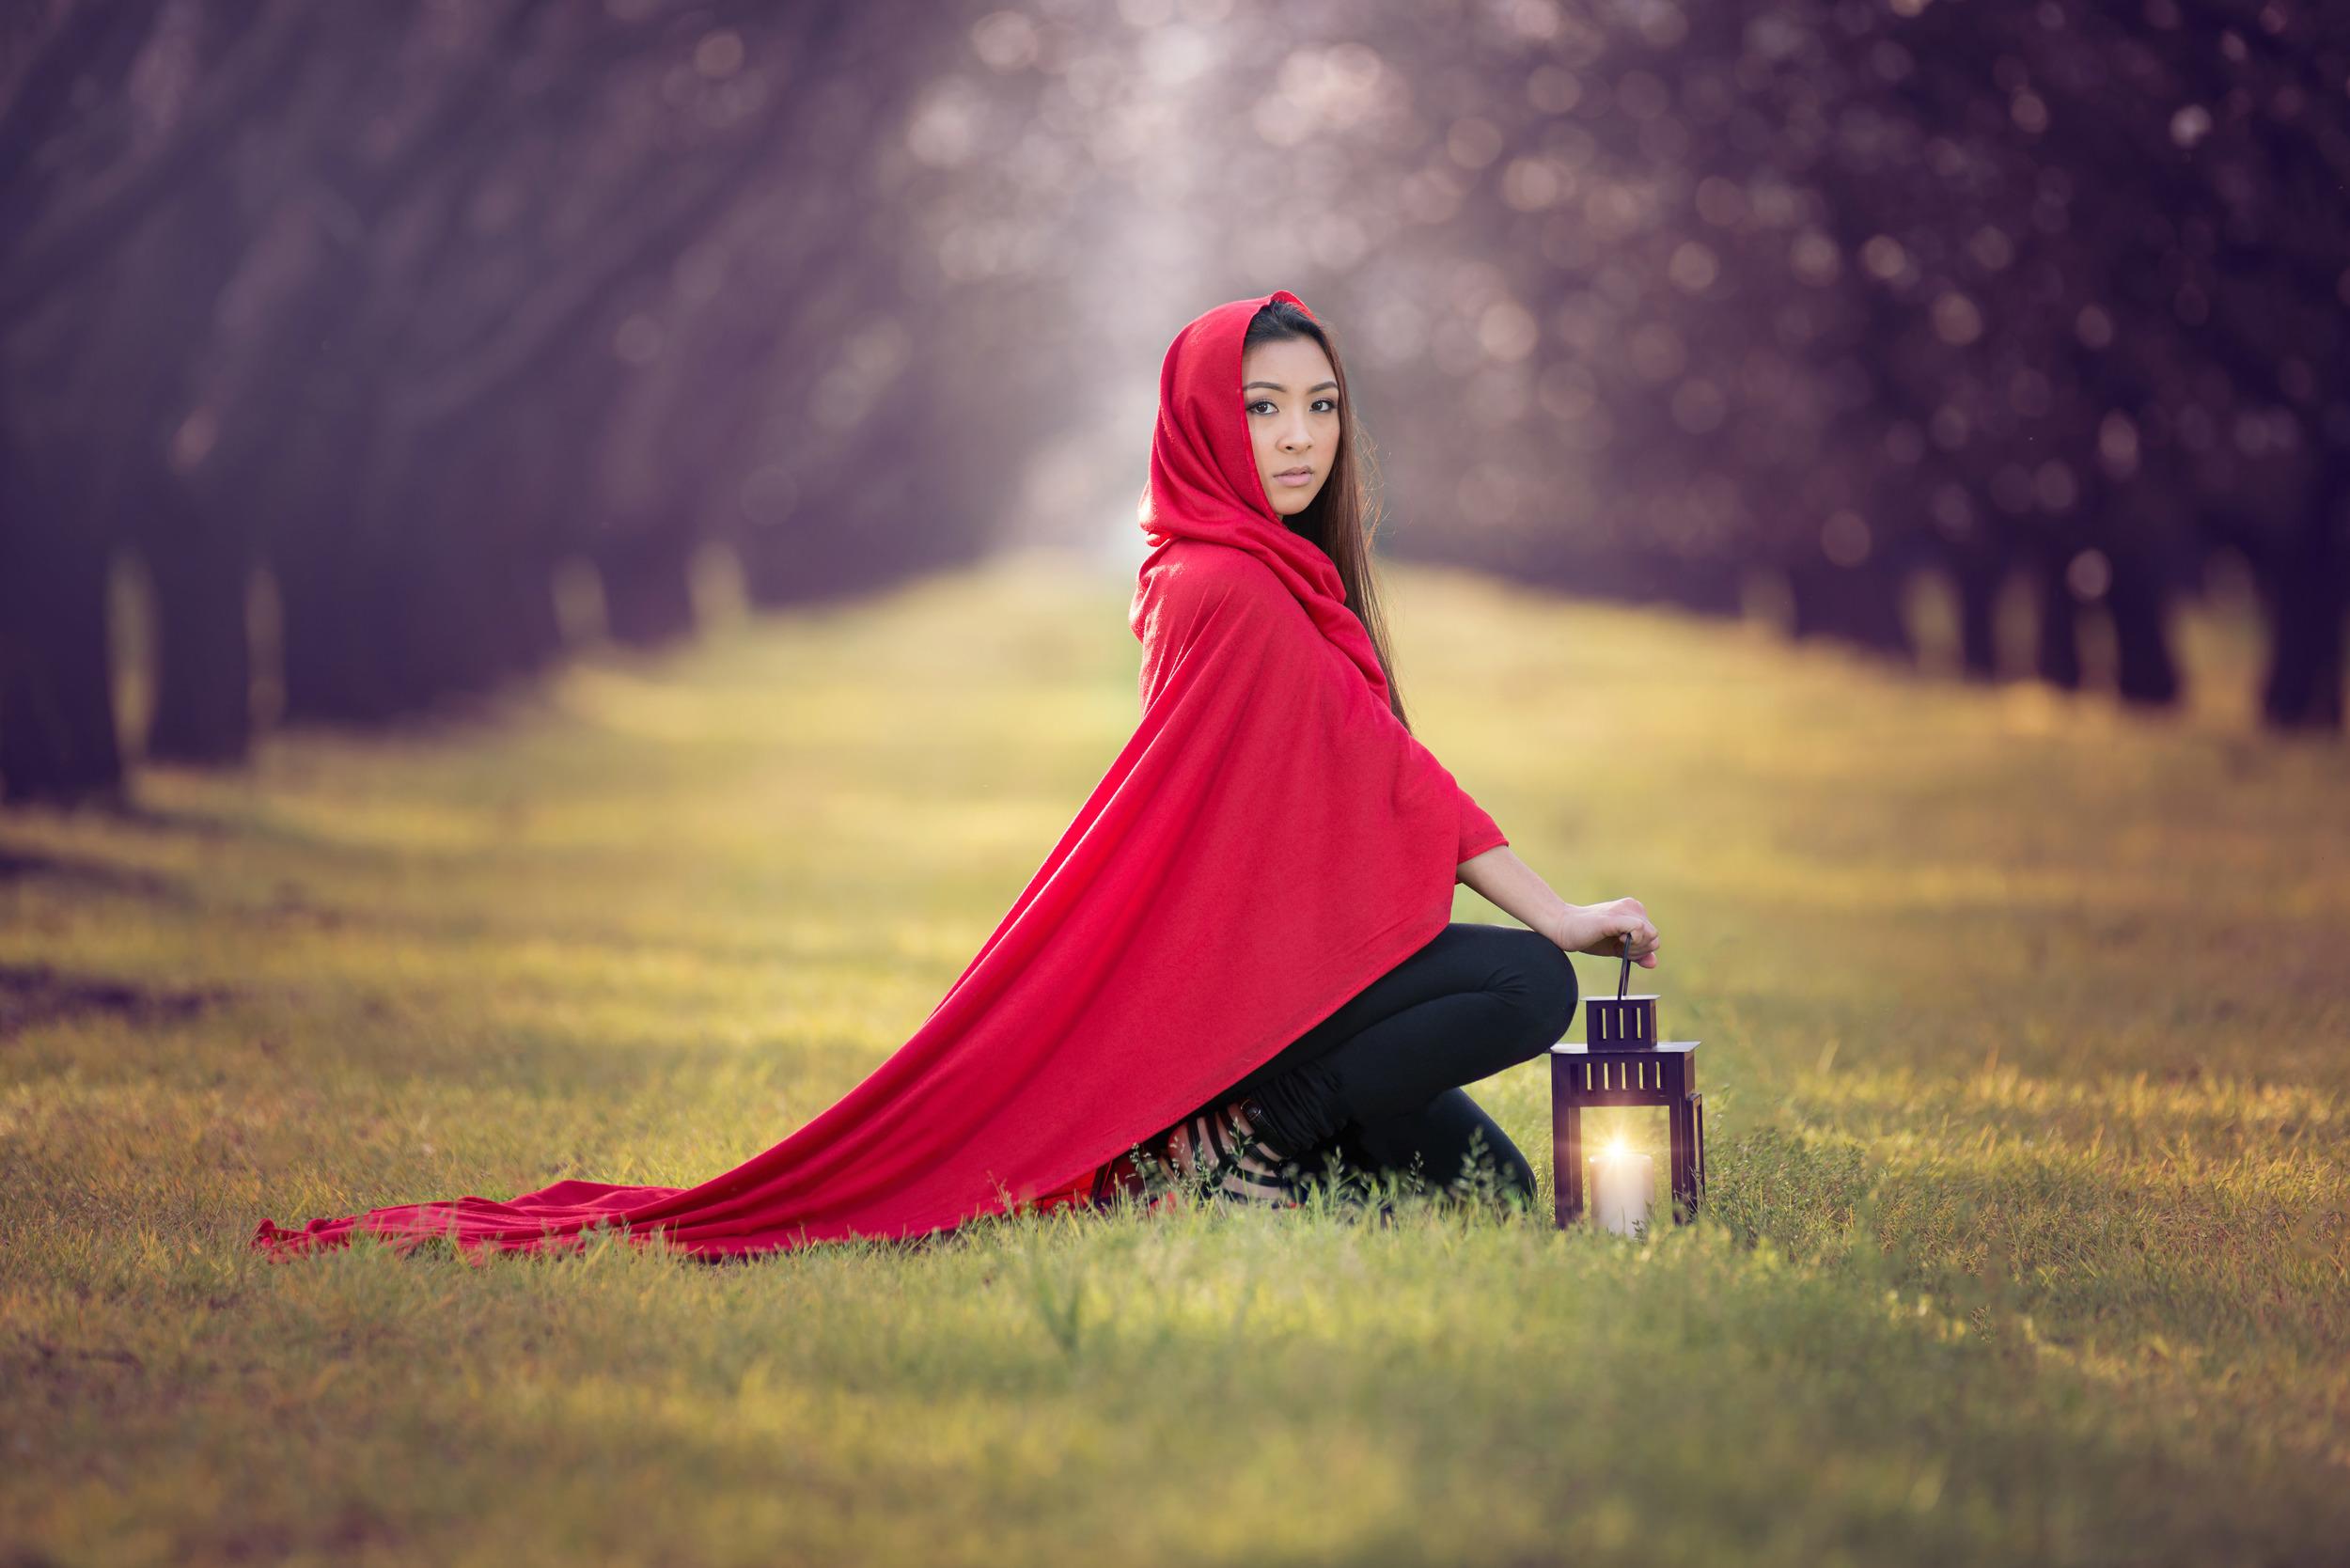 Red Riding Hood-5021.jpg